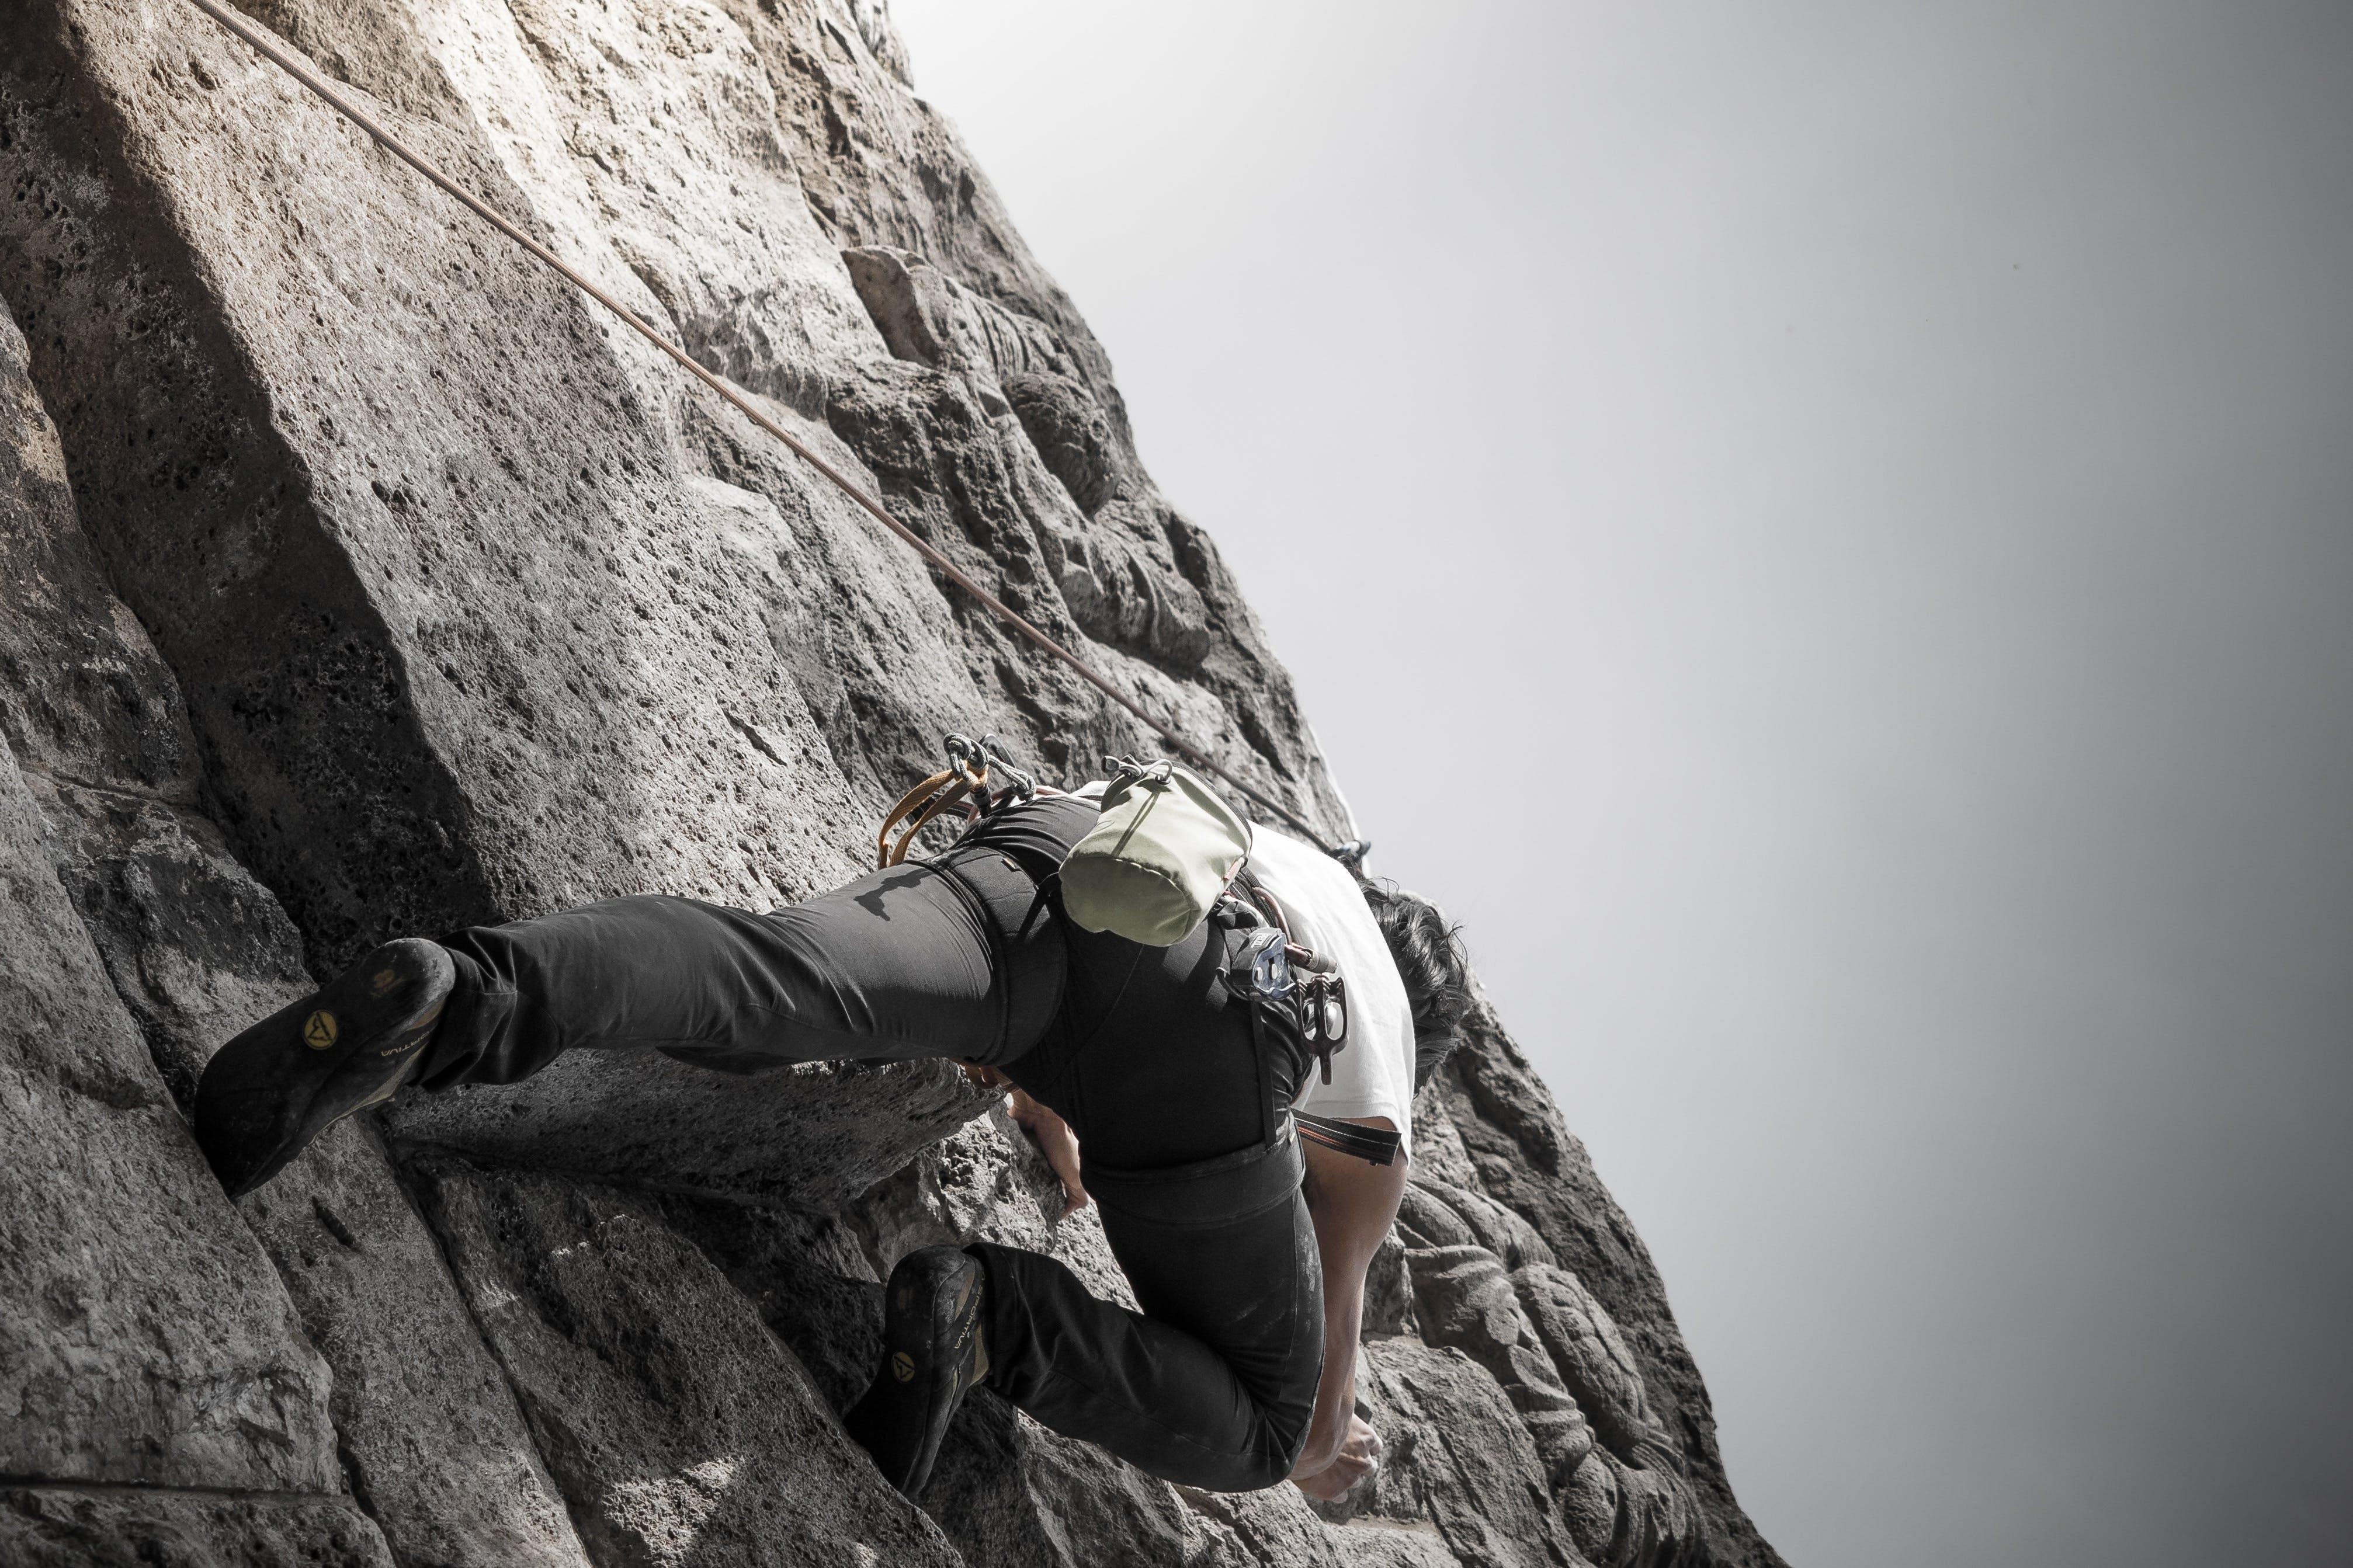 adventure, cliff, extreme